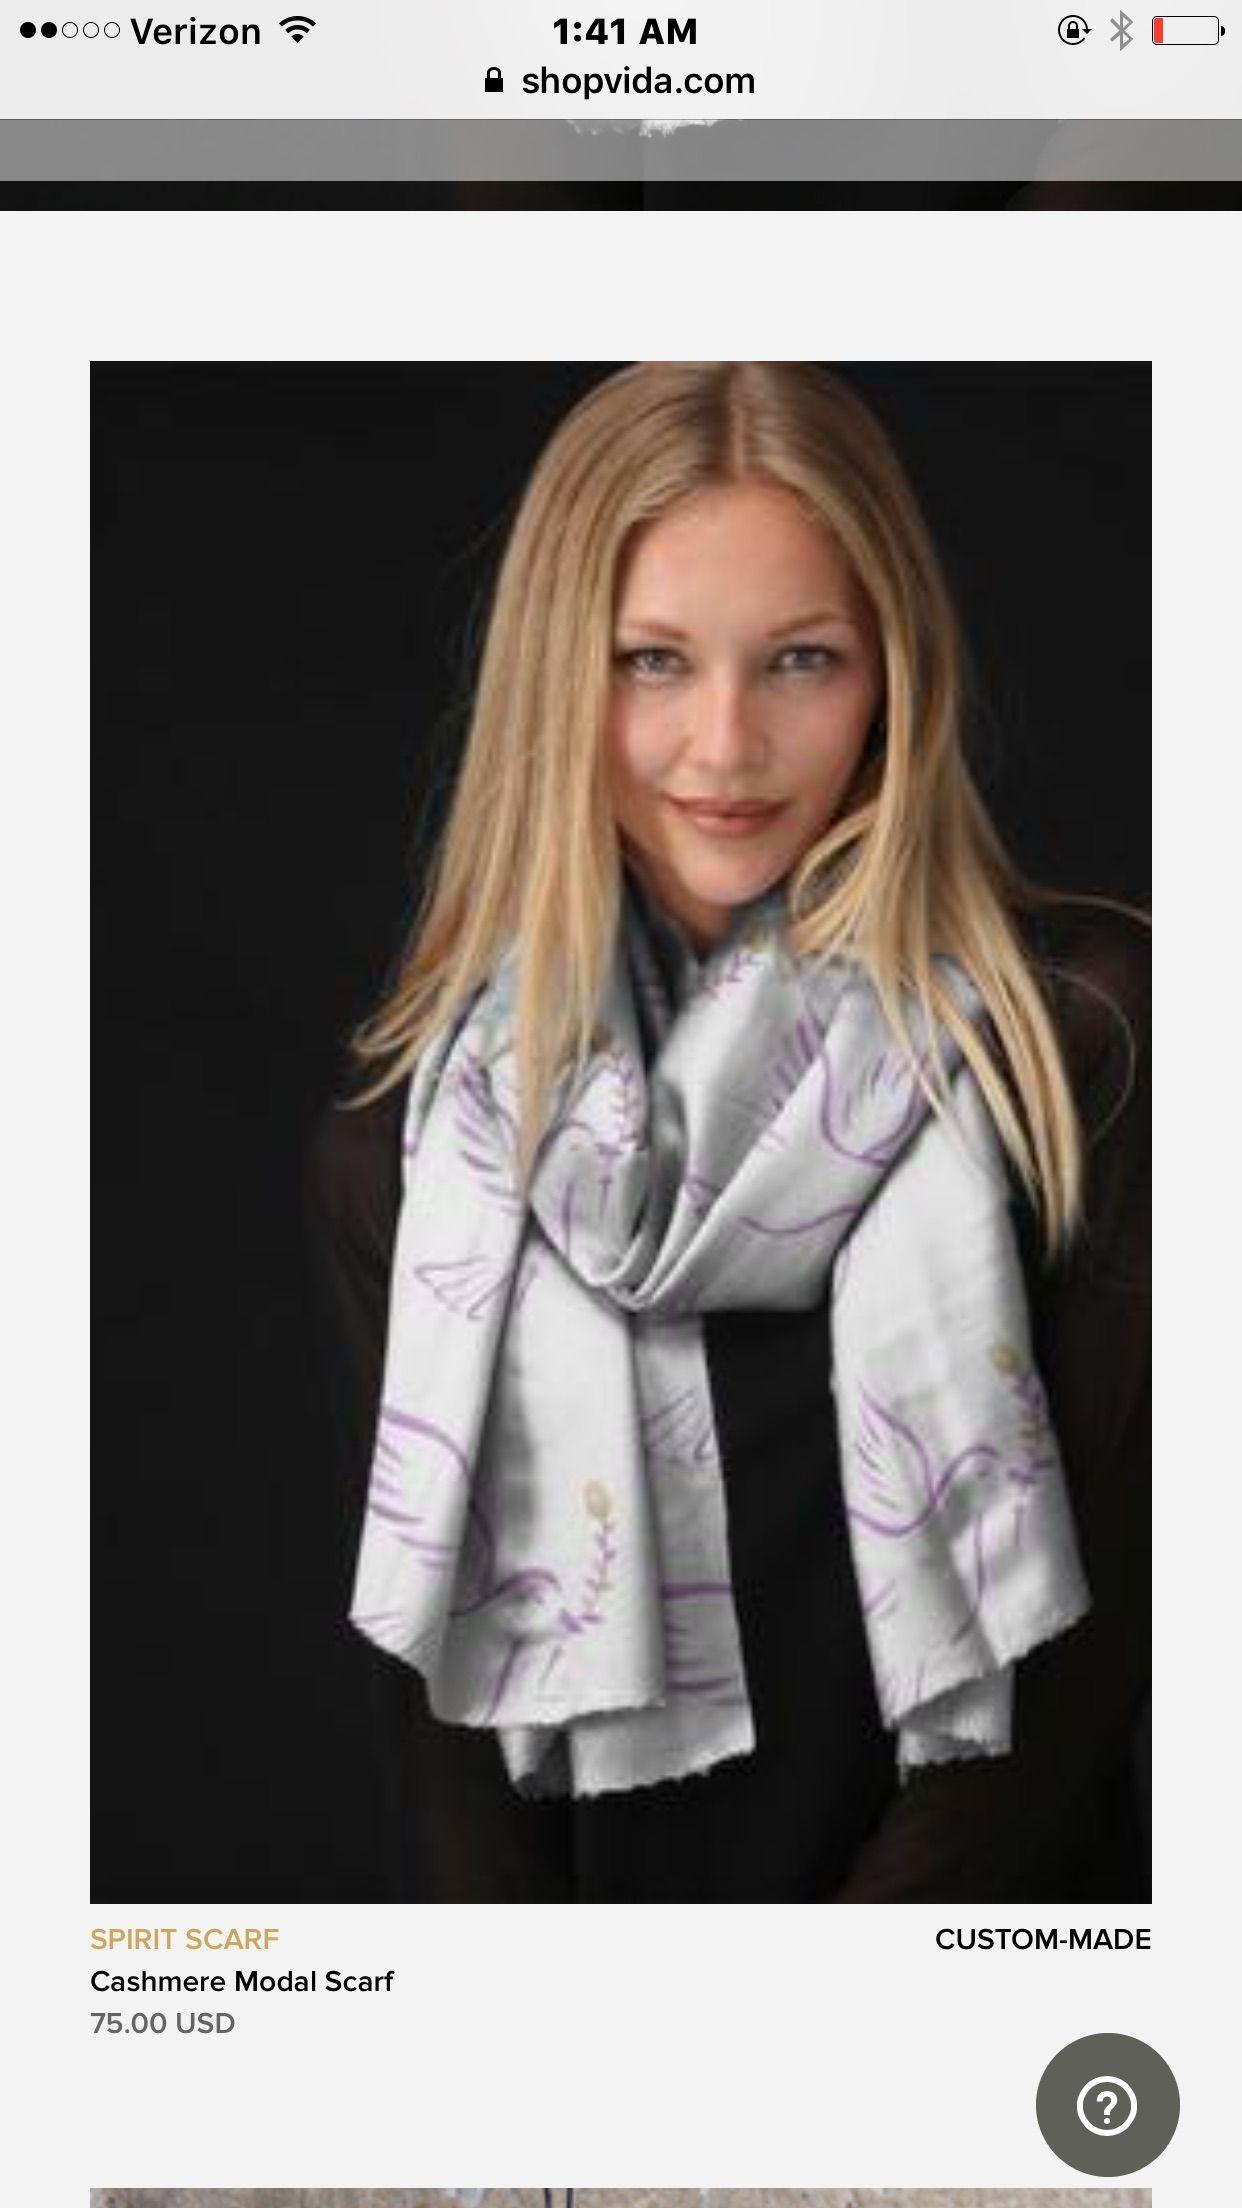 Cashmere Silk Scarf - Shine Silk Scarf by VIDA VIDA cONoNN